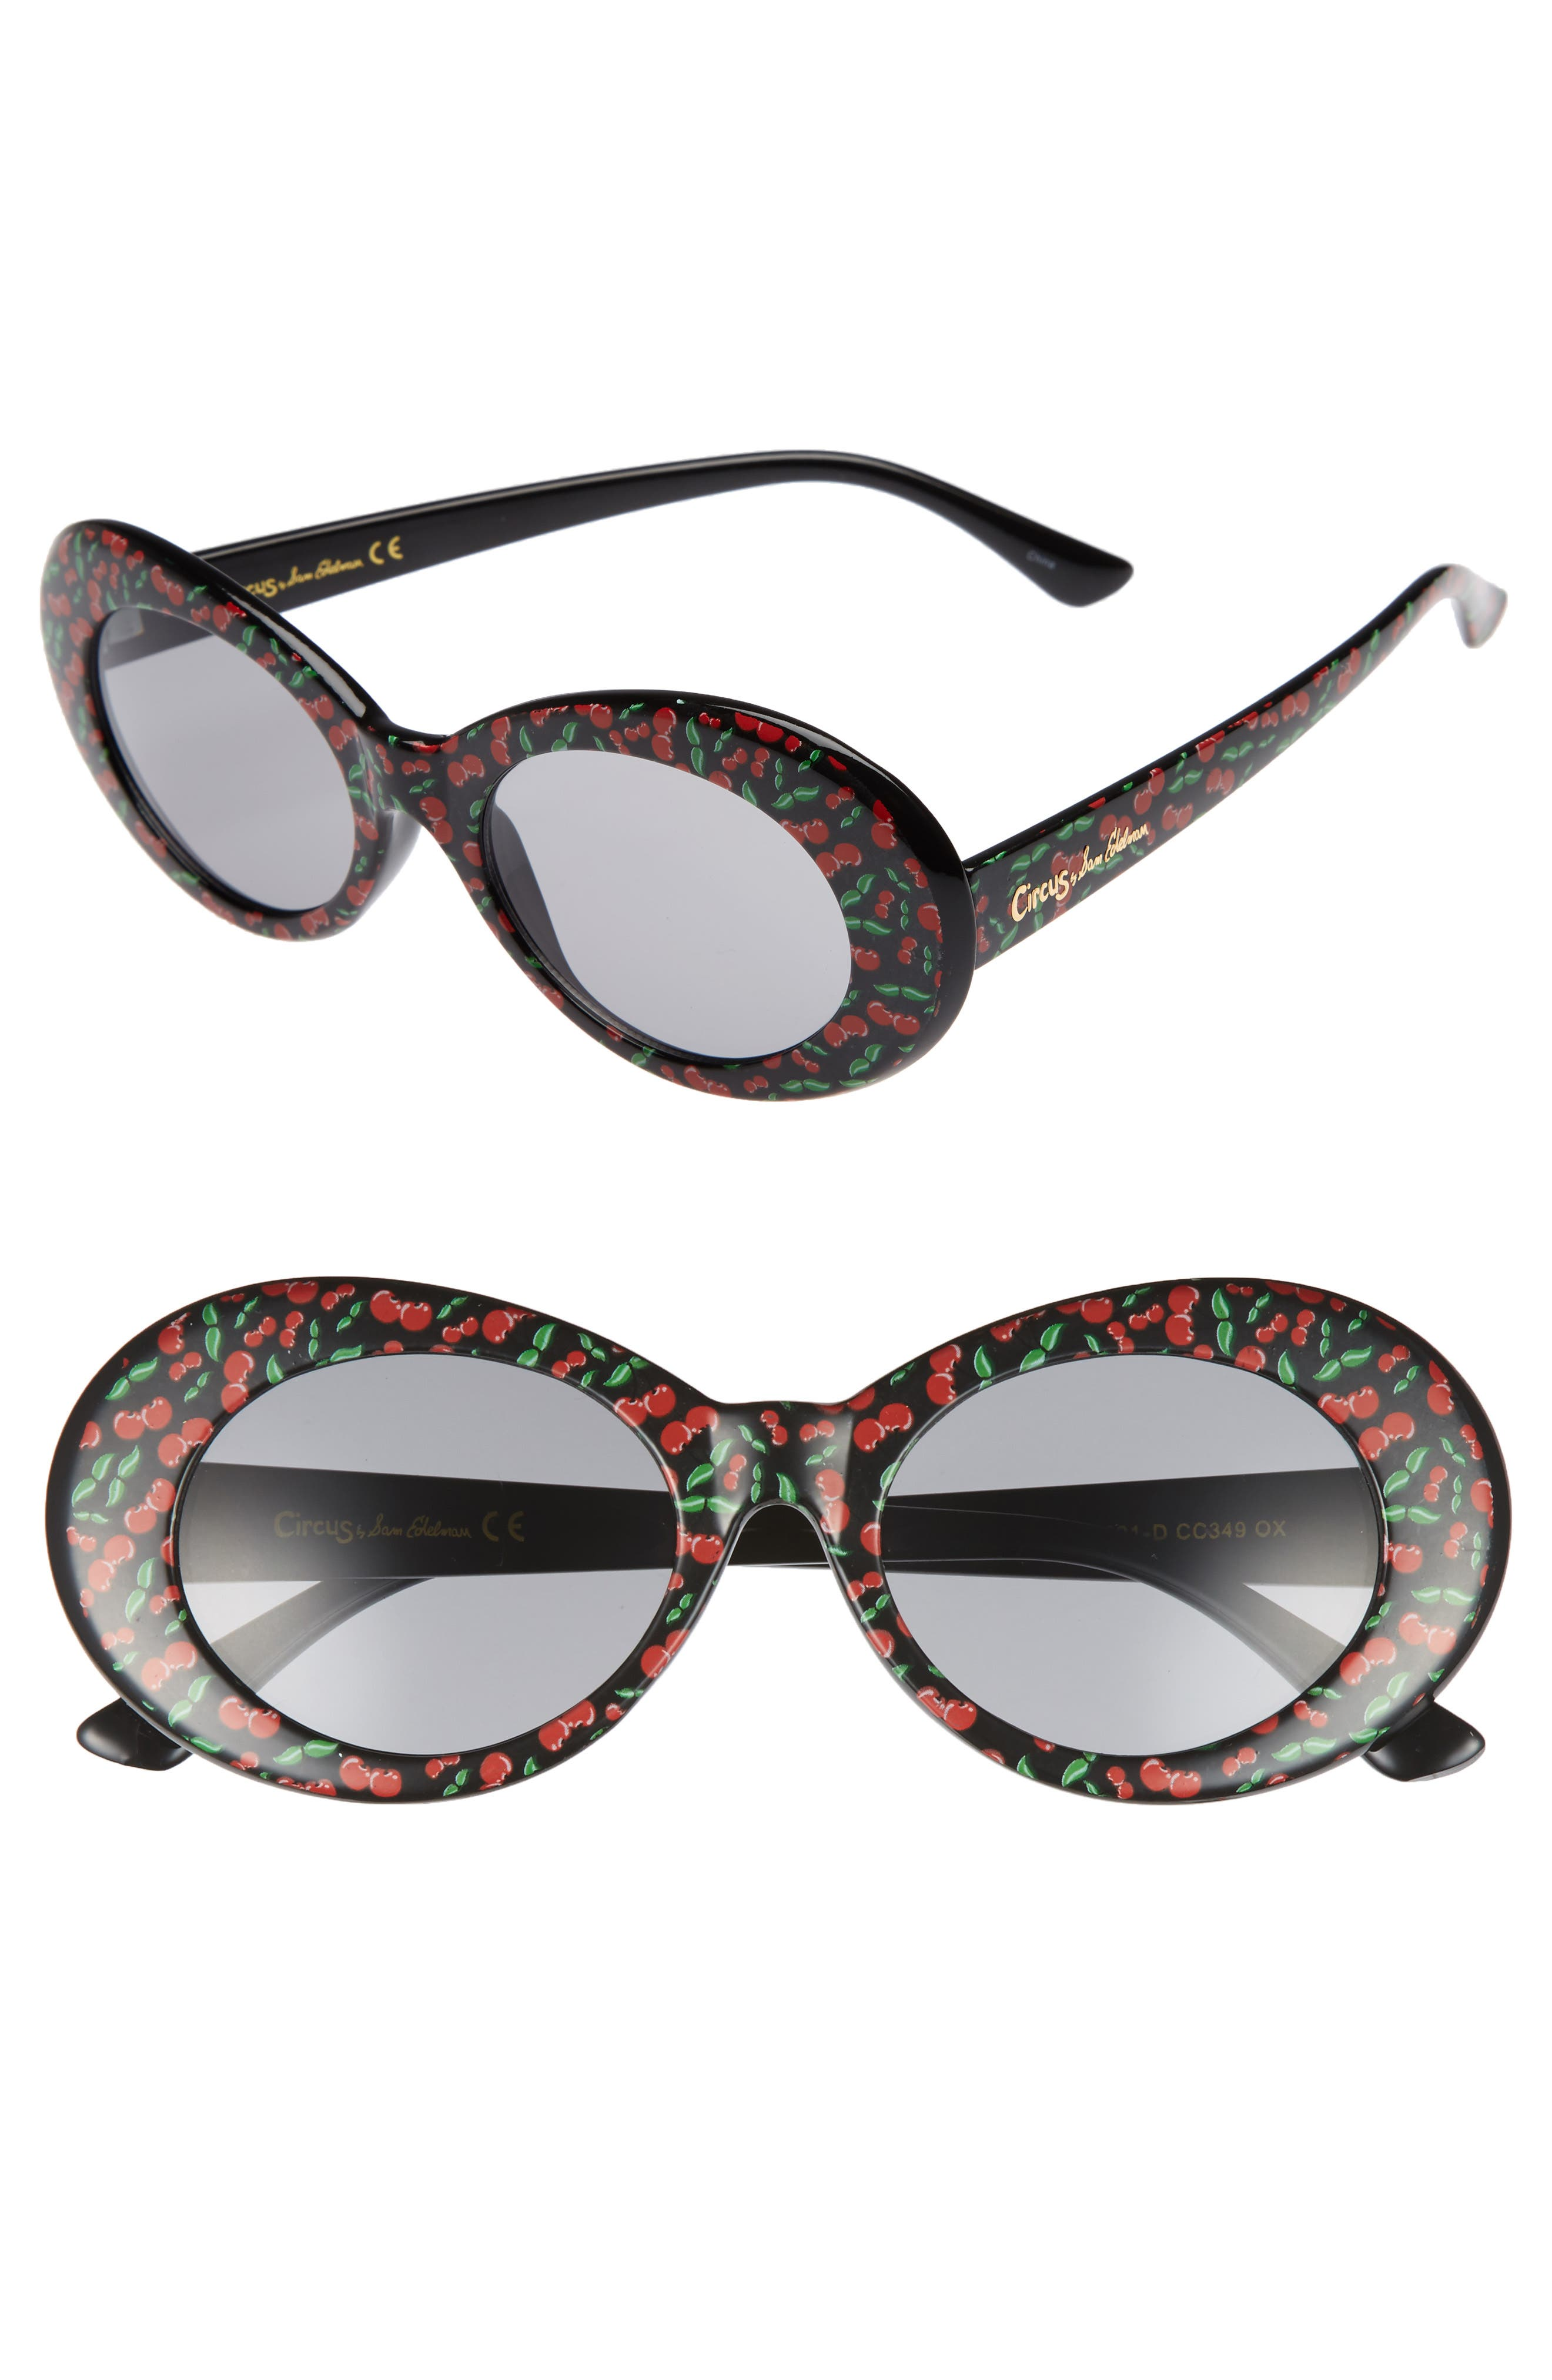 50mm Cherry Print Oval Sunglasses,                             Main thumbnail 1, color,                             008